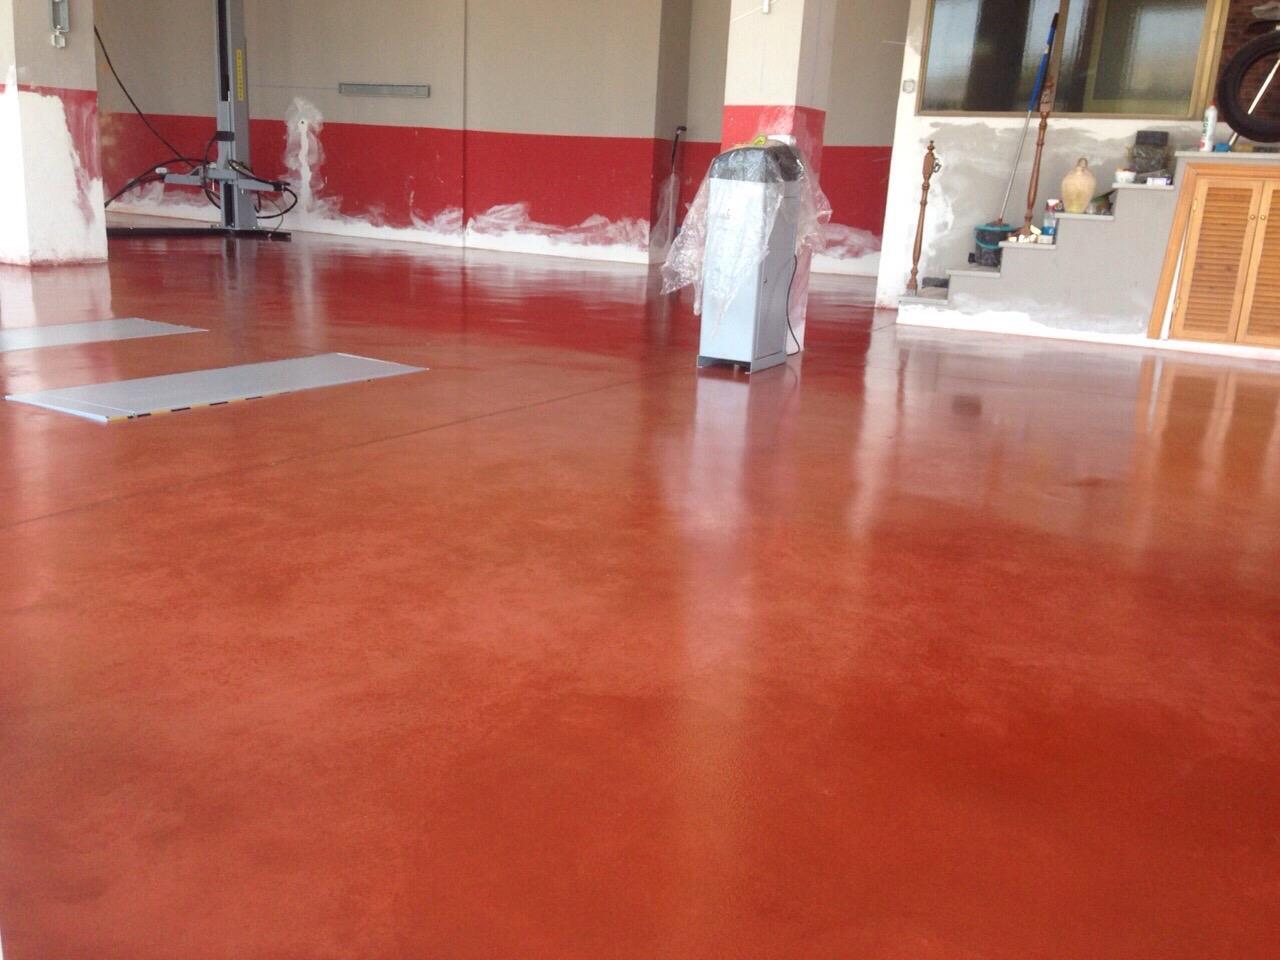 Pavimentos de hormigon fratasado pavimentos de hormigon pulido - Suelo de cemento pulido precio ...